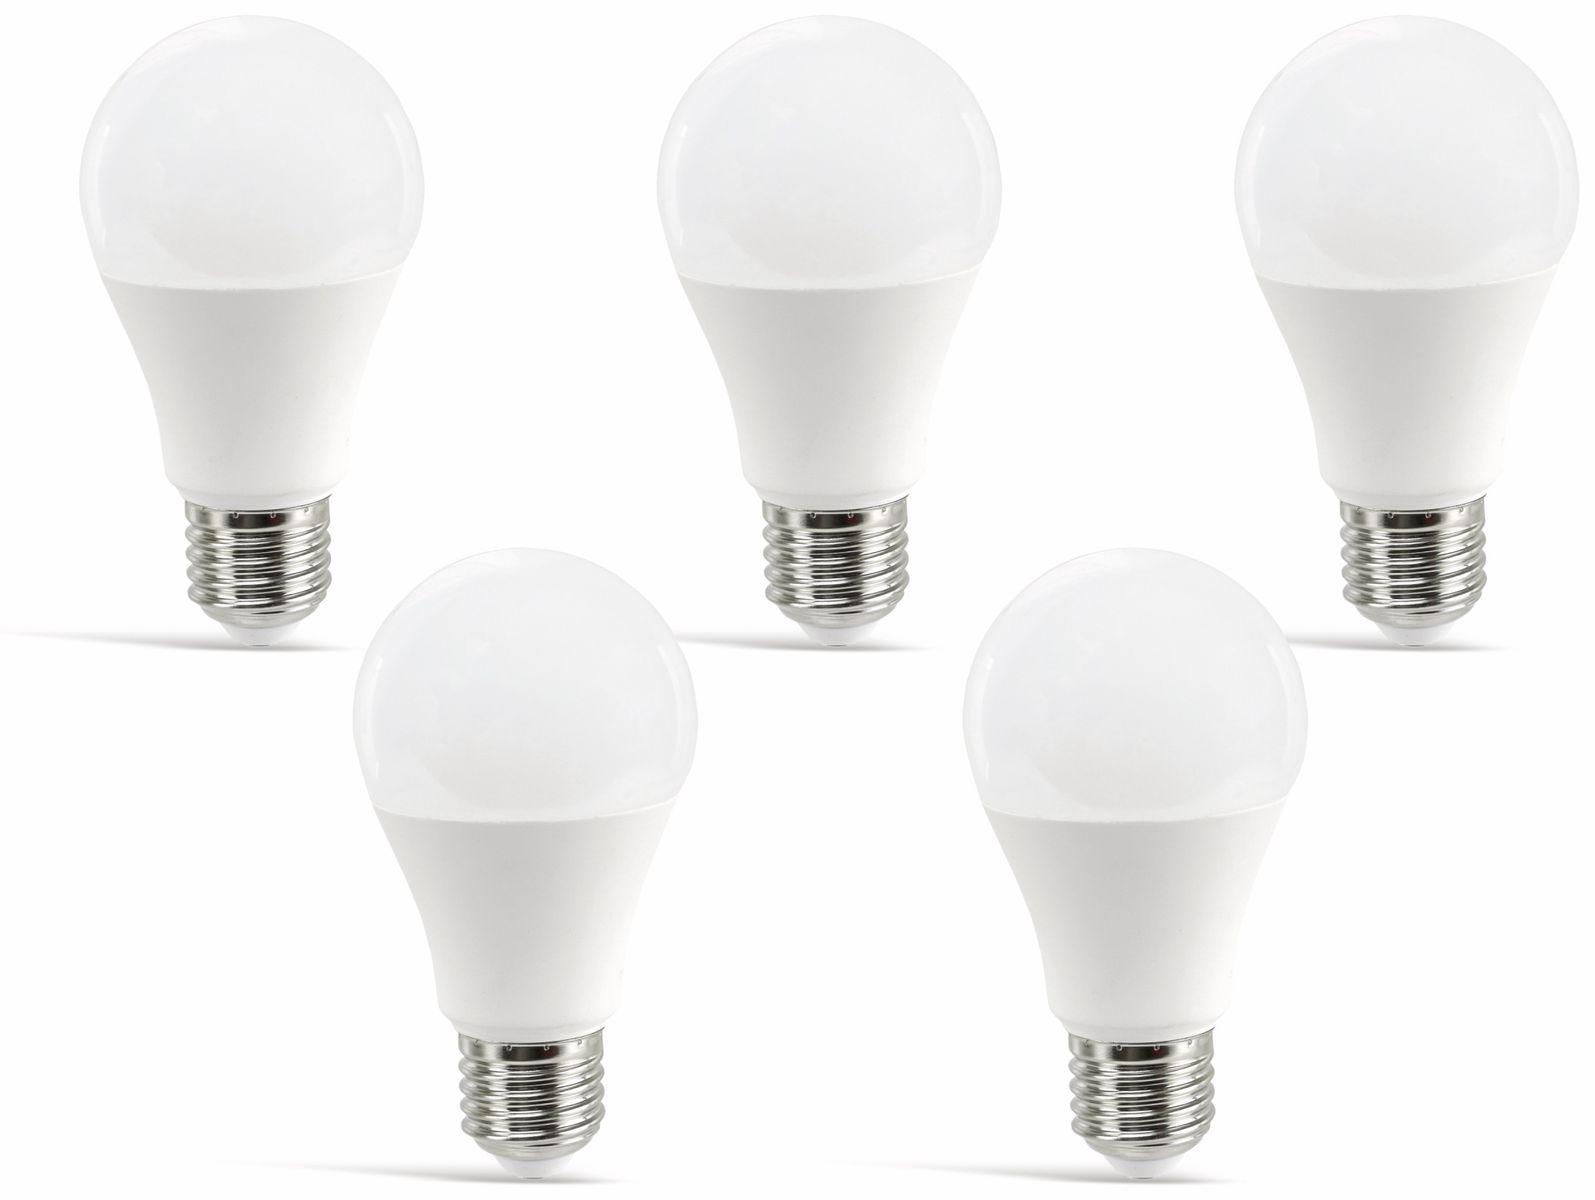 LED-Lampe, E27, A+, 9W, 2700K, 806lm Daylite